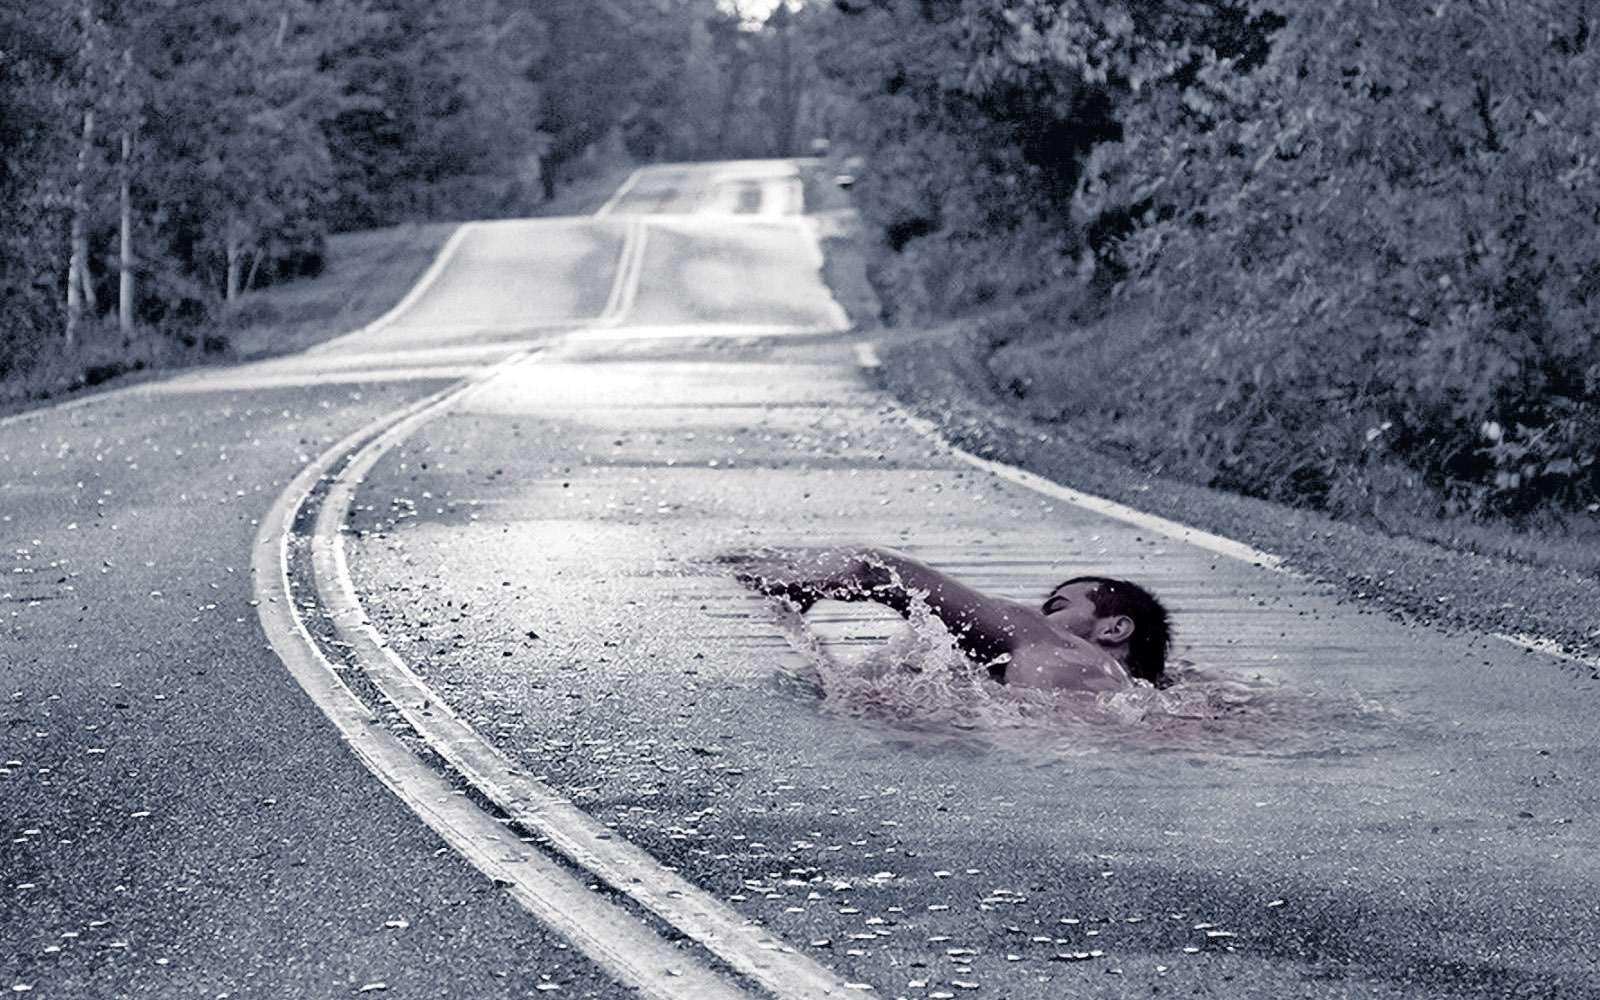 Вода против автомобиля. 8задачек ЗР— фото 784762